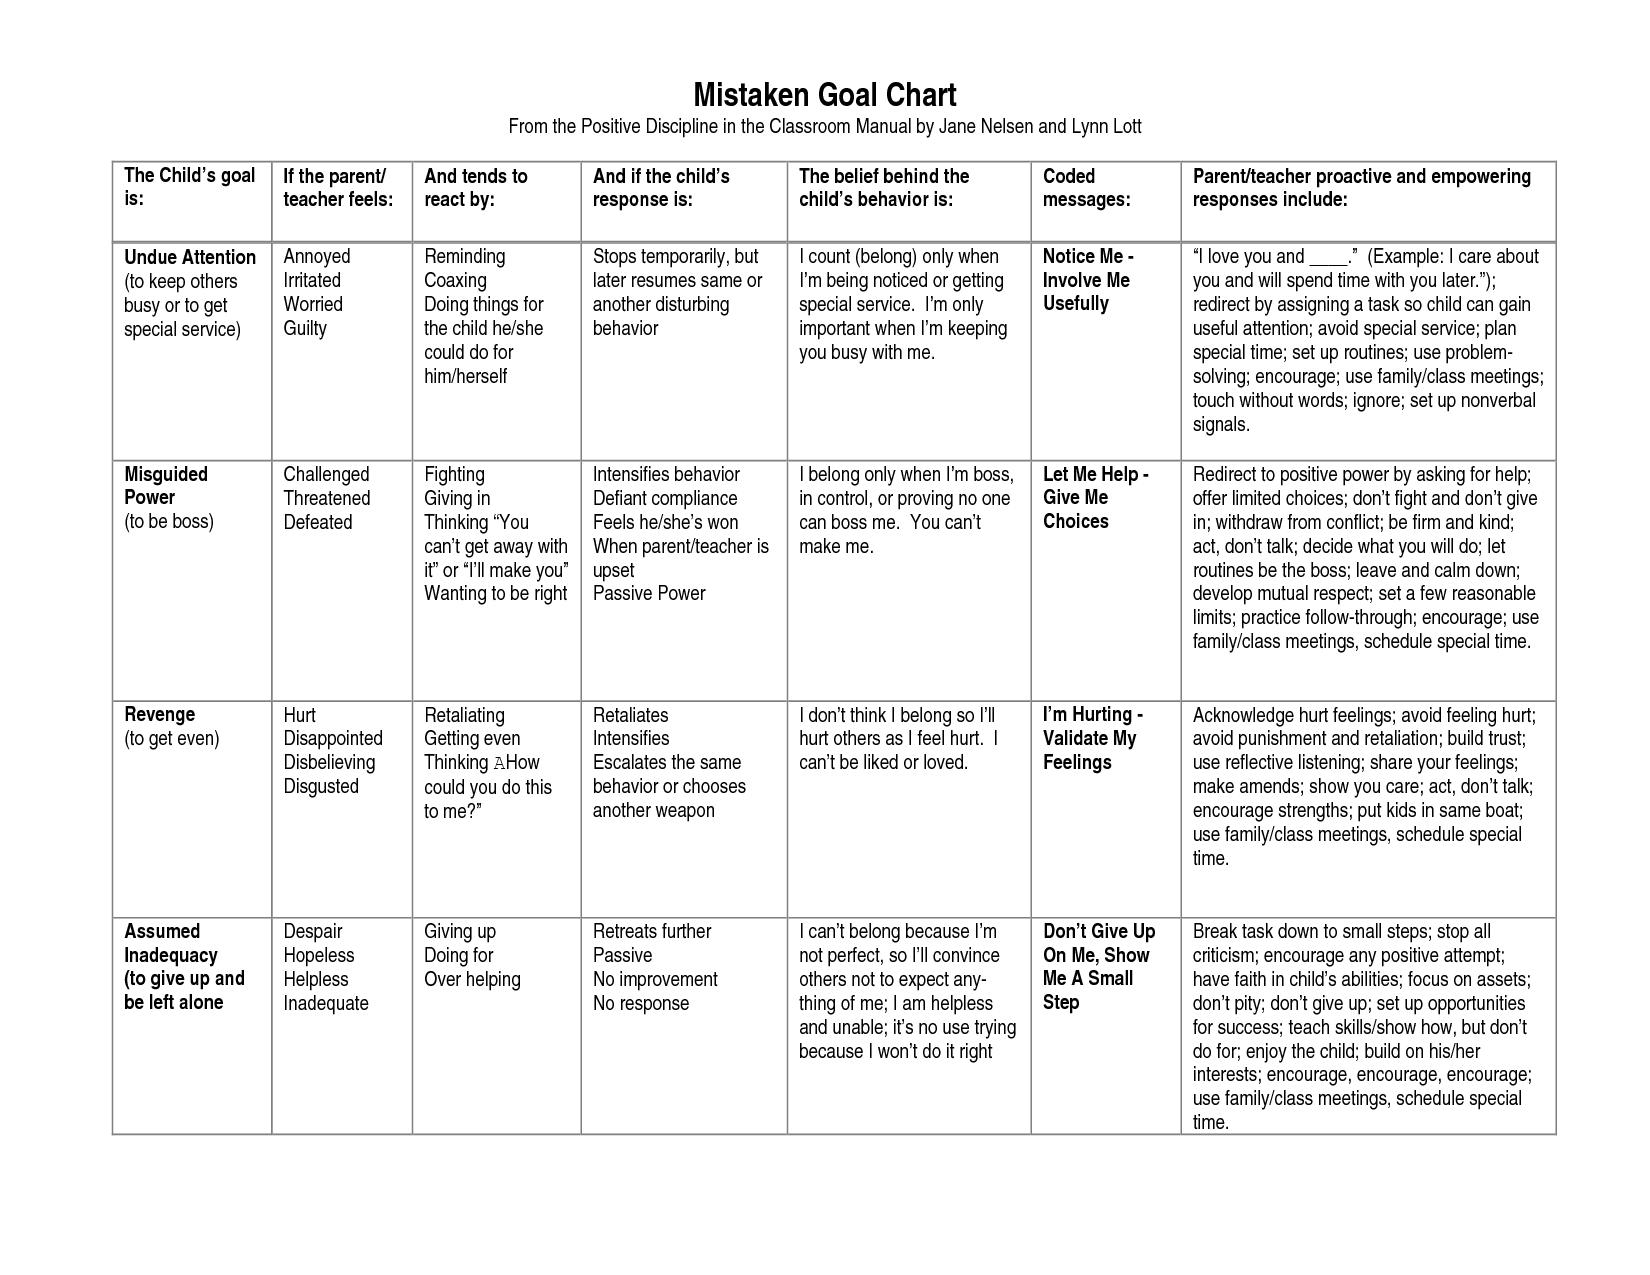 4 Mistaken Goals Chart From The Positive Discipline